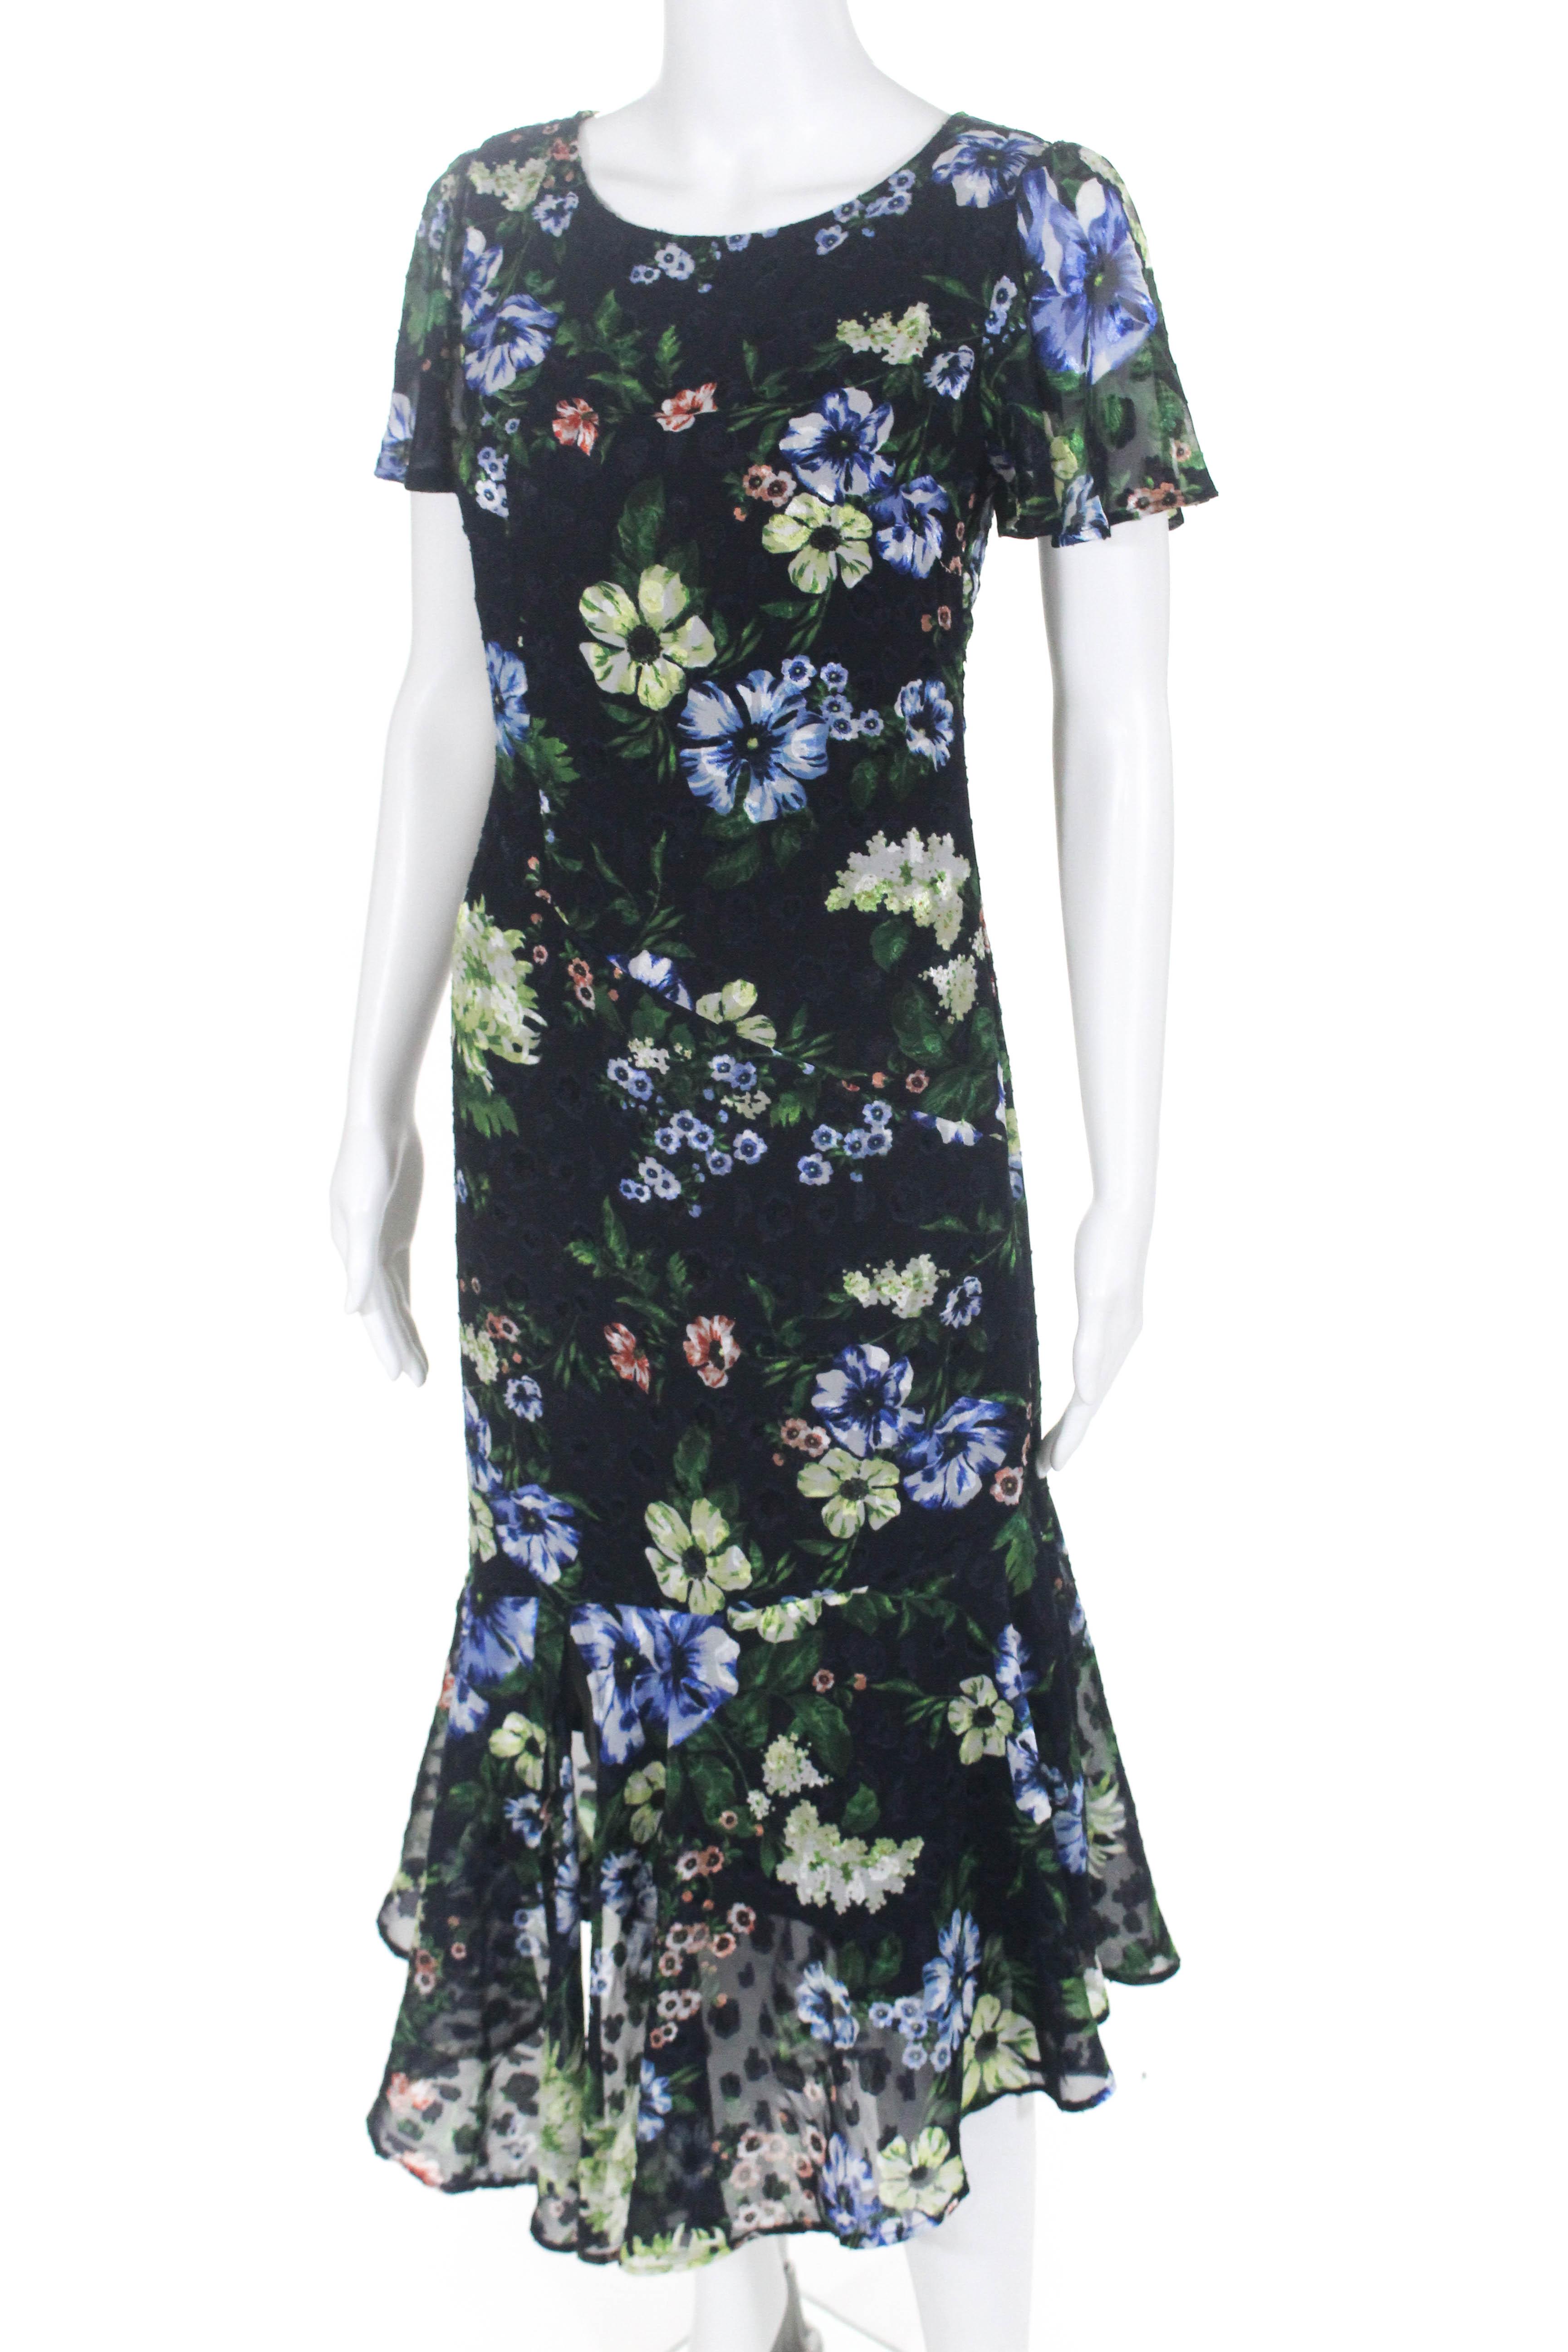 c4cae2af72 Navy Blue Short Sleeve Midi Dress